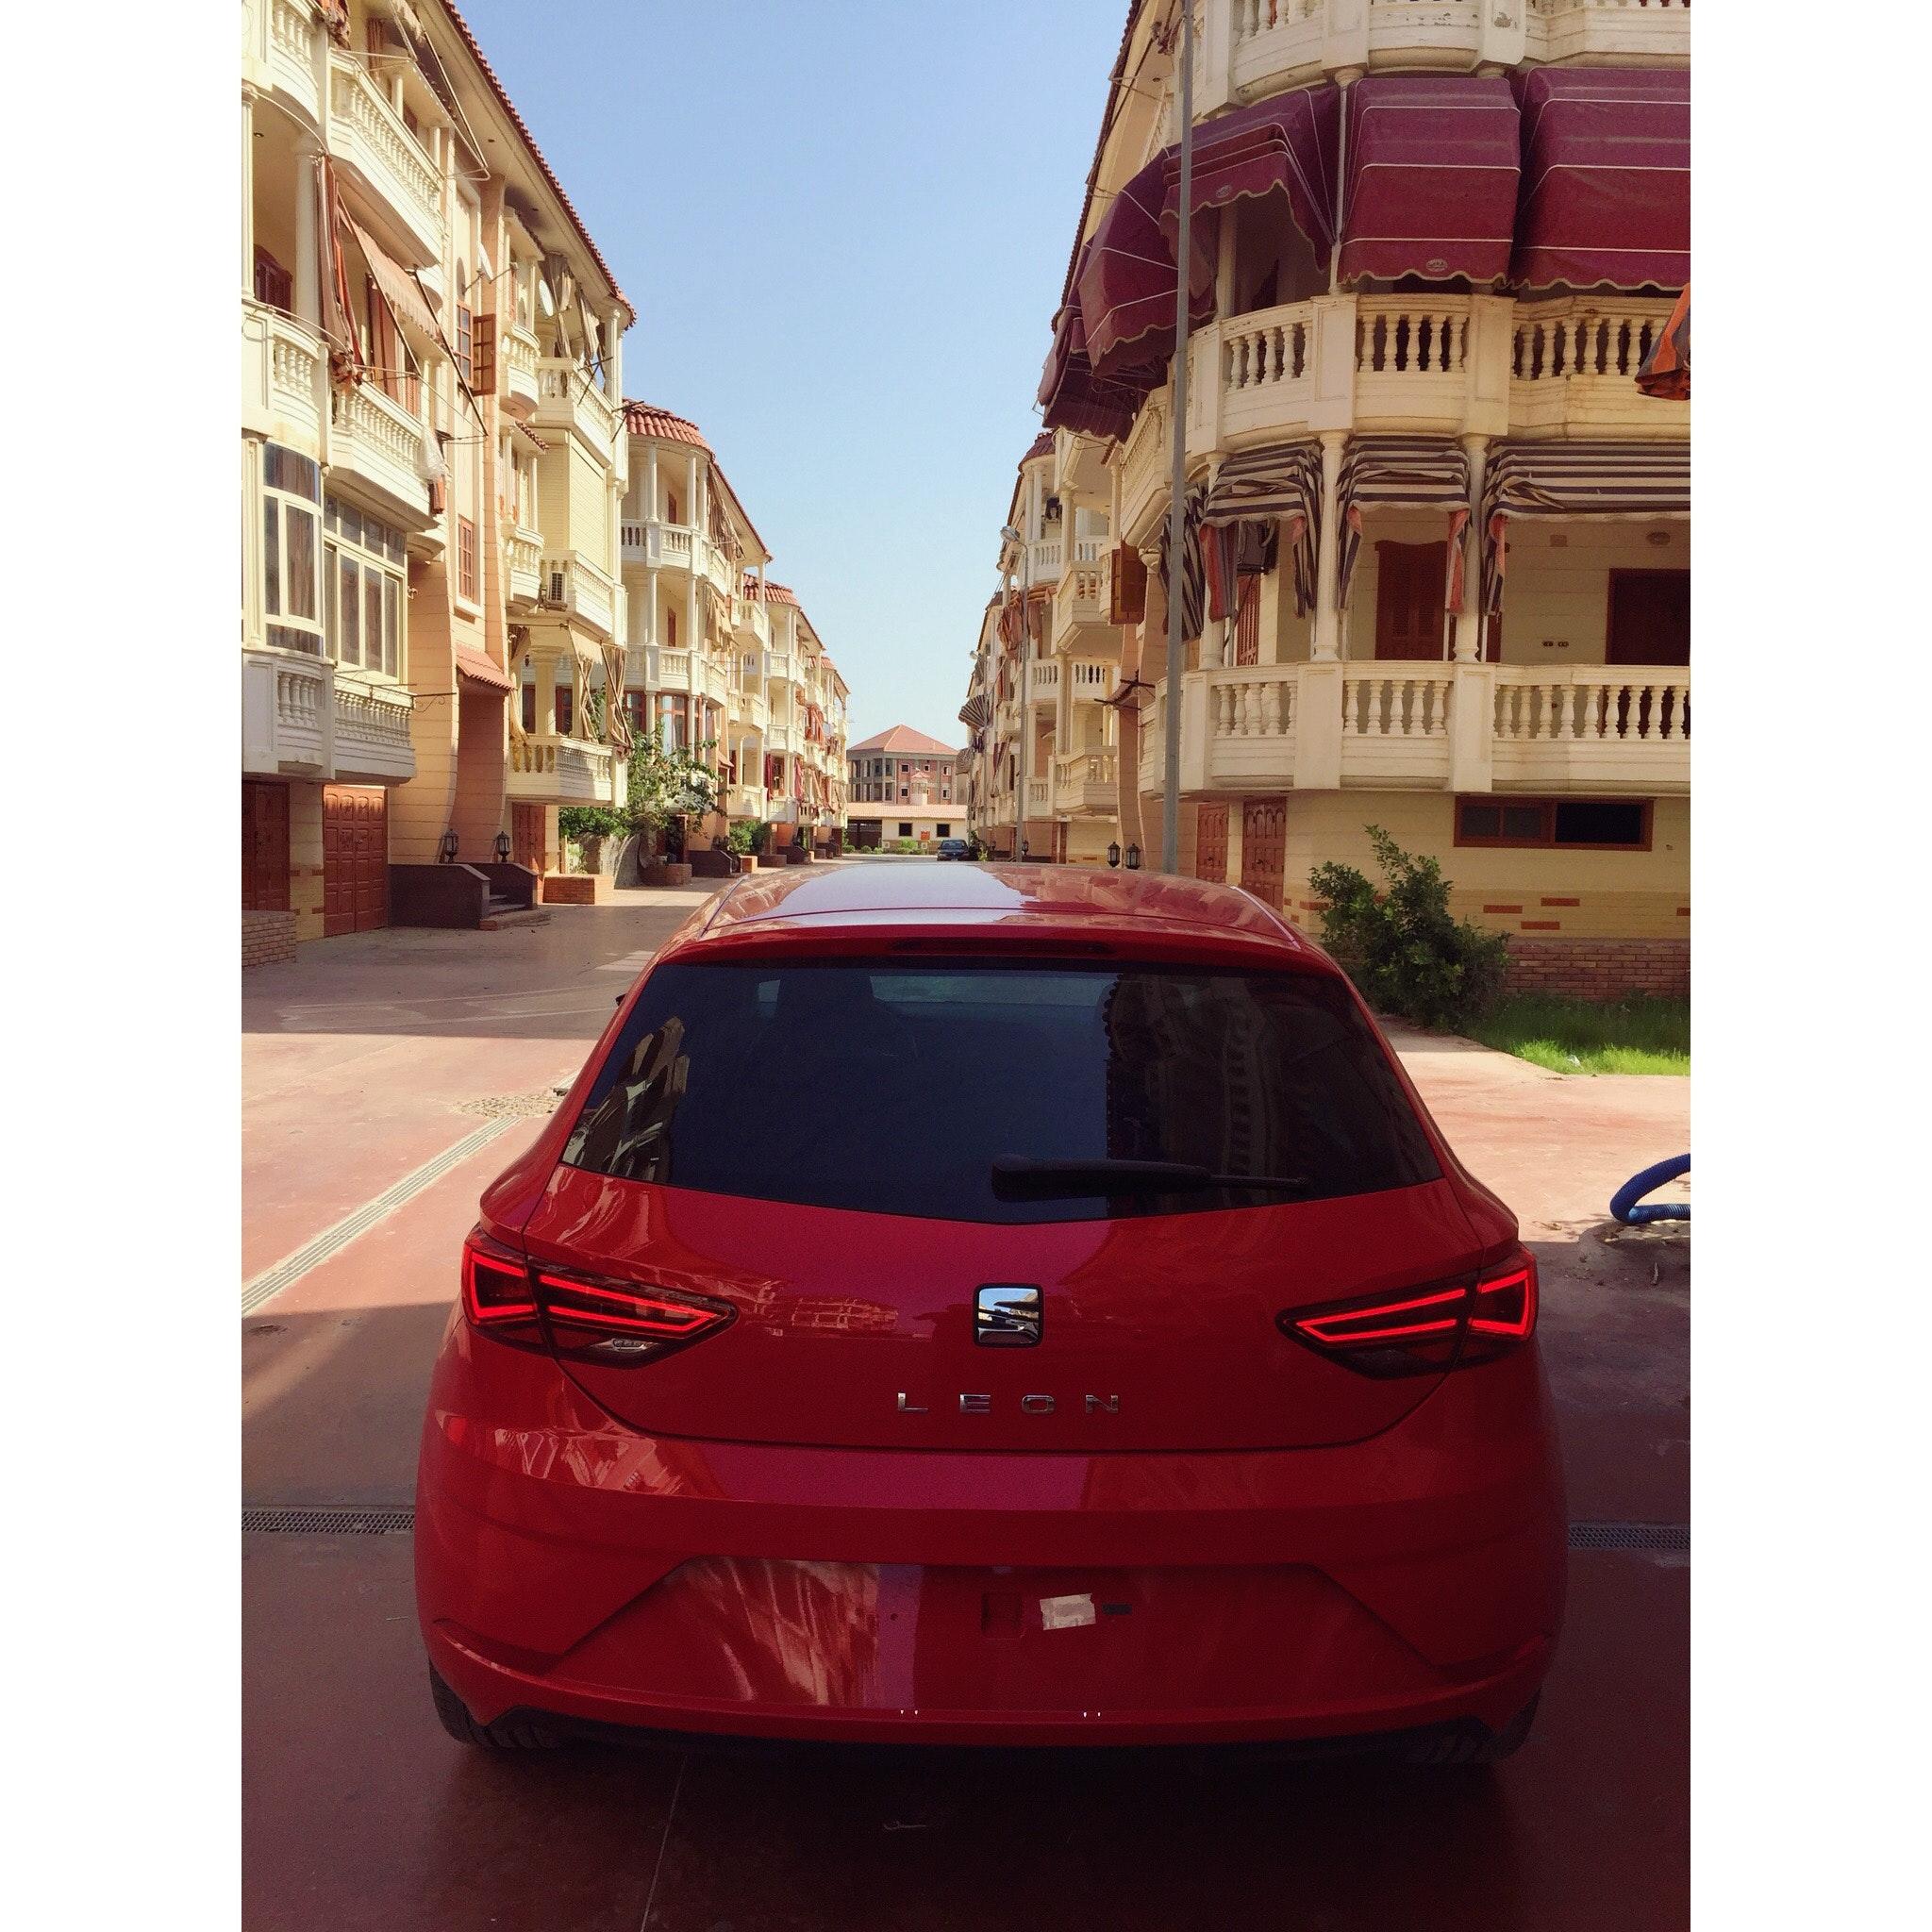 Red Seat Leon, Sedan, Vehicle, Urban, Transportation system, HQ Photo